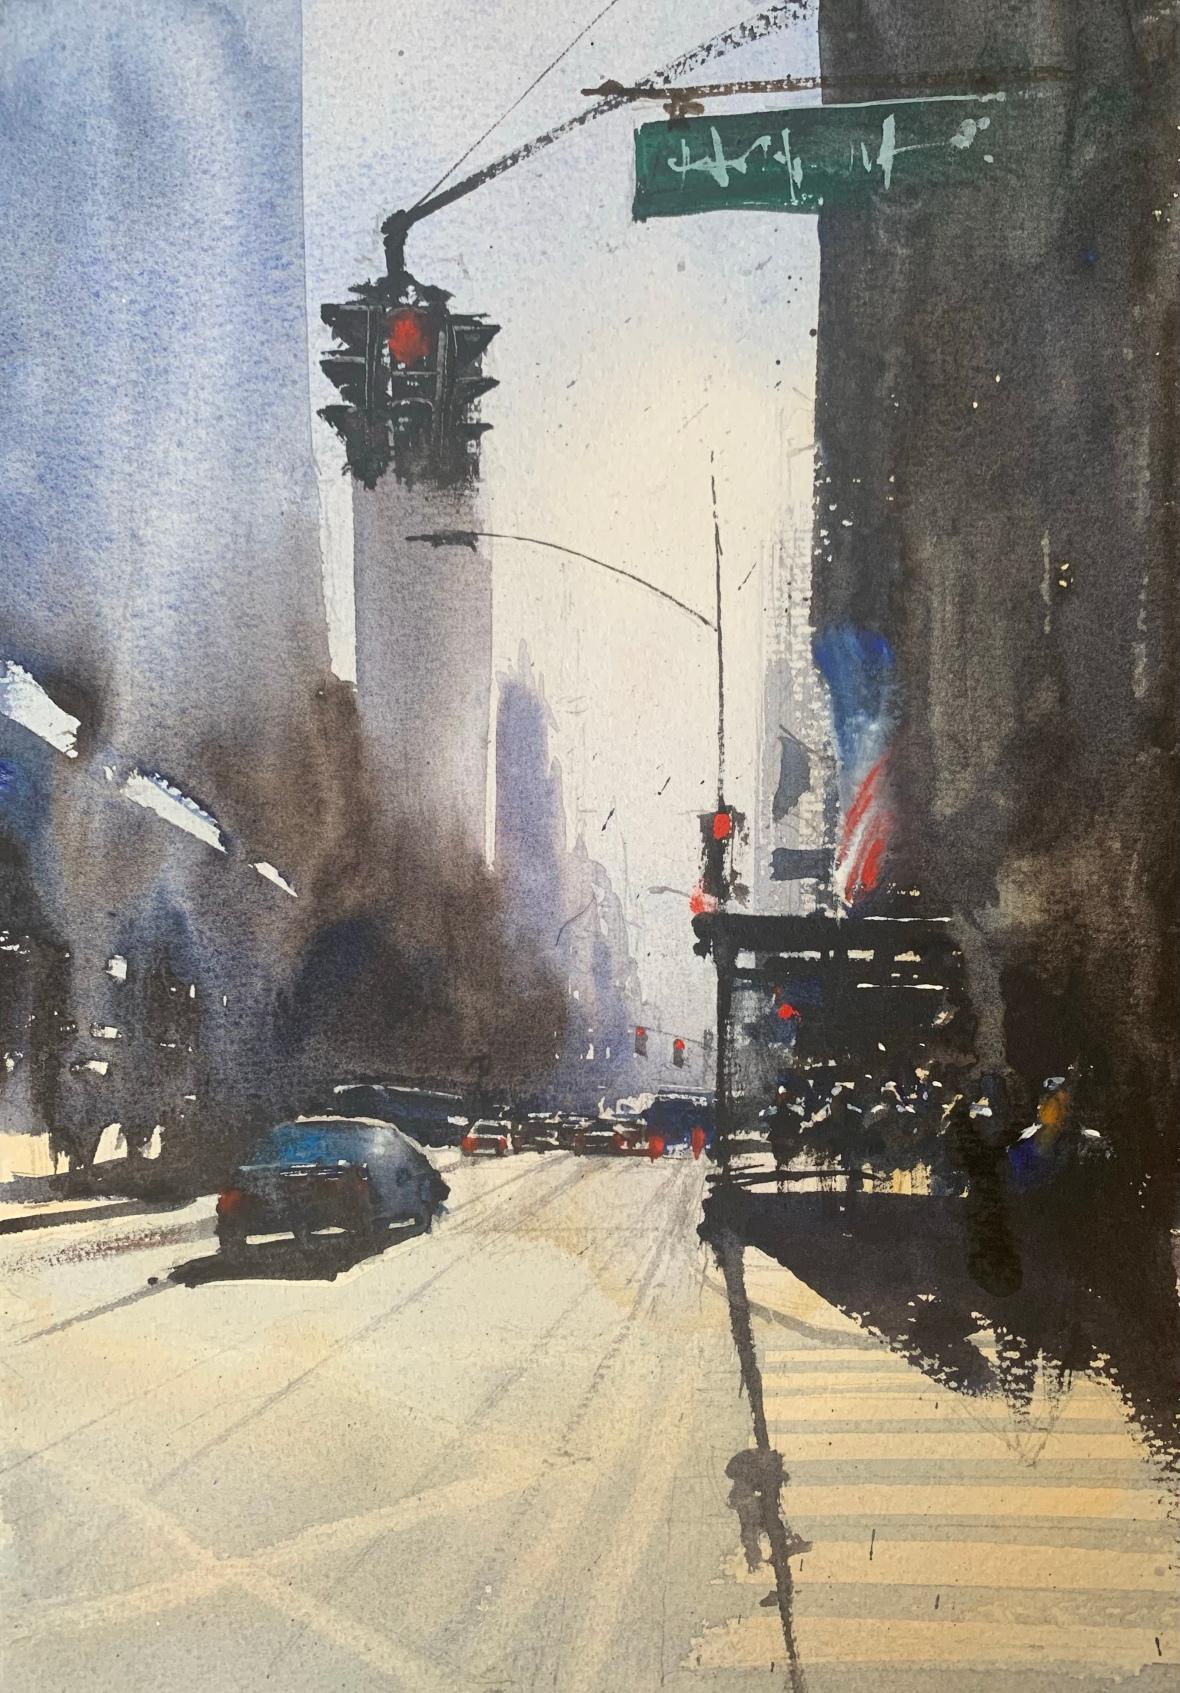 Watercolour painting of a New York street scene by artist John Haywood